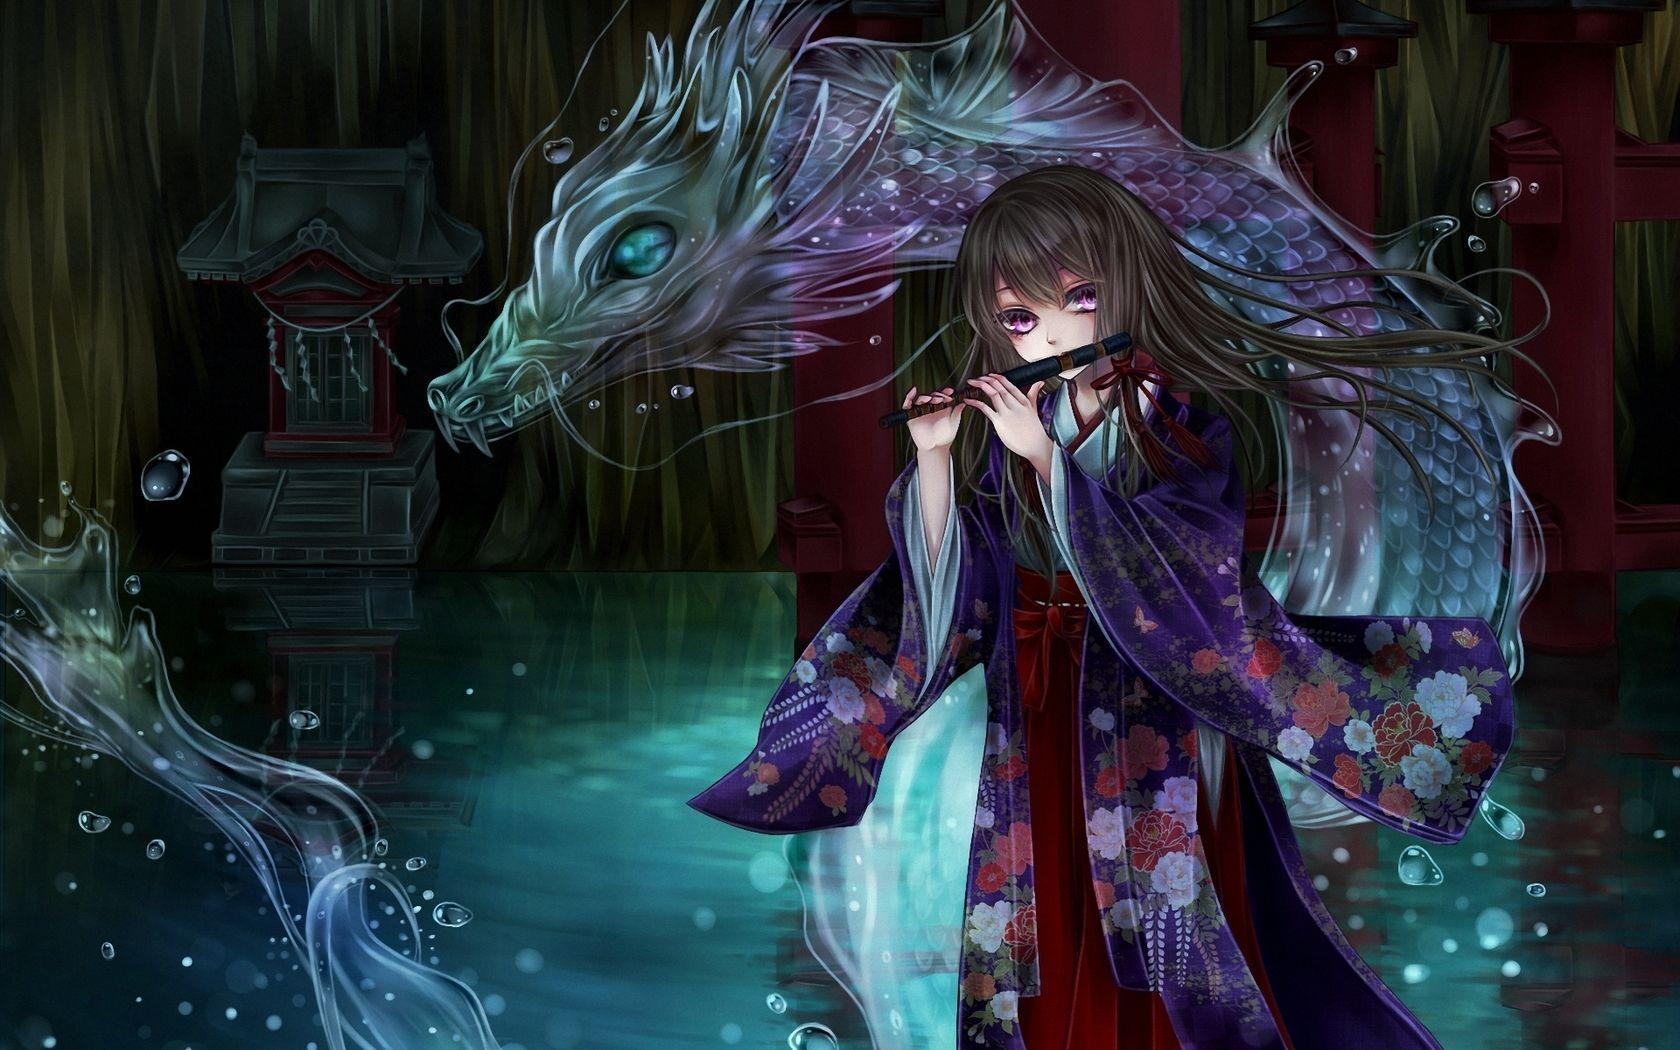 FHDQ Anime Dragon, by Dreda Handscomb